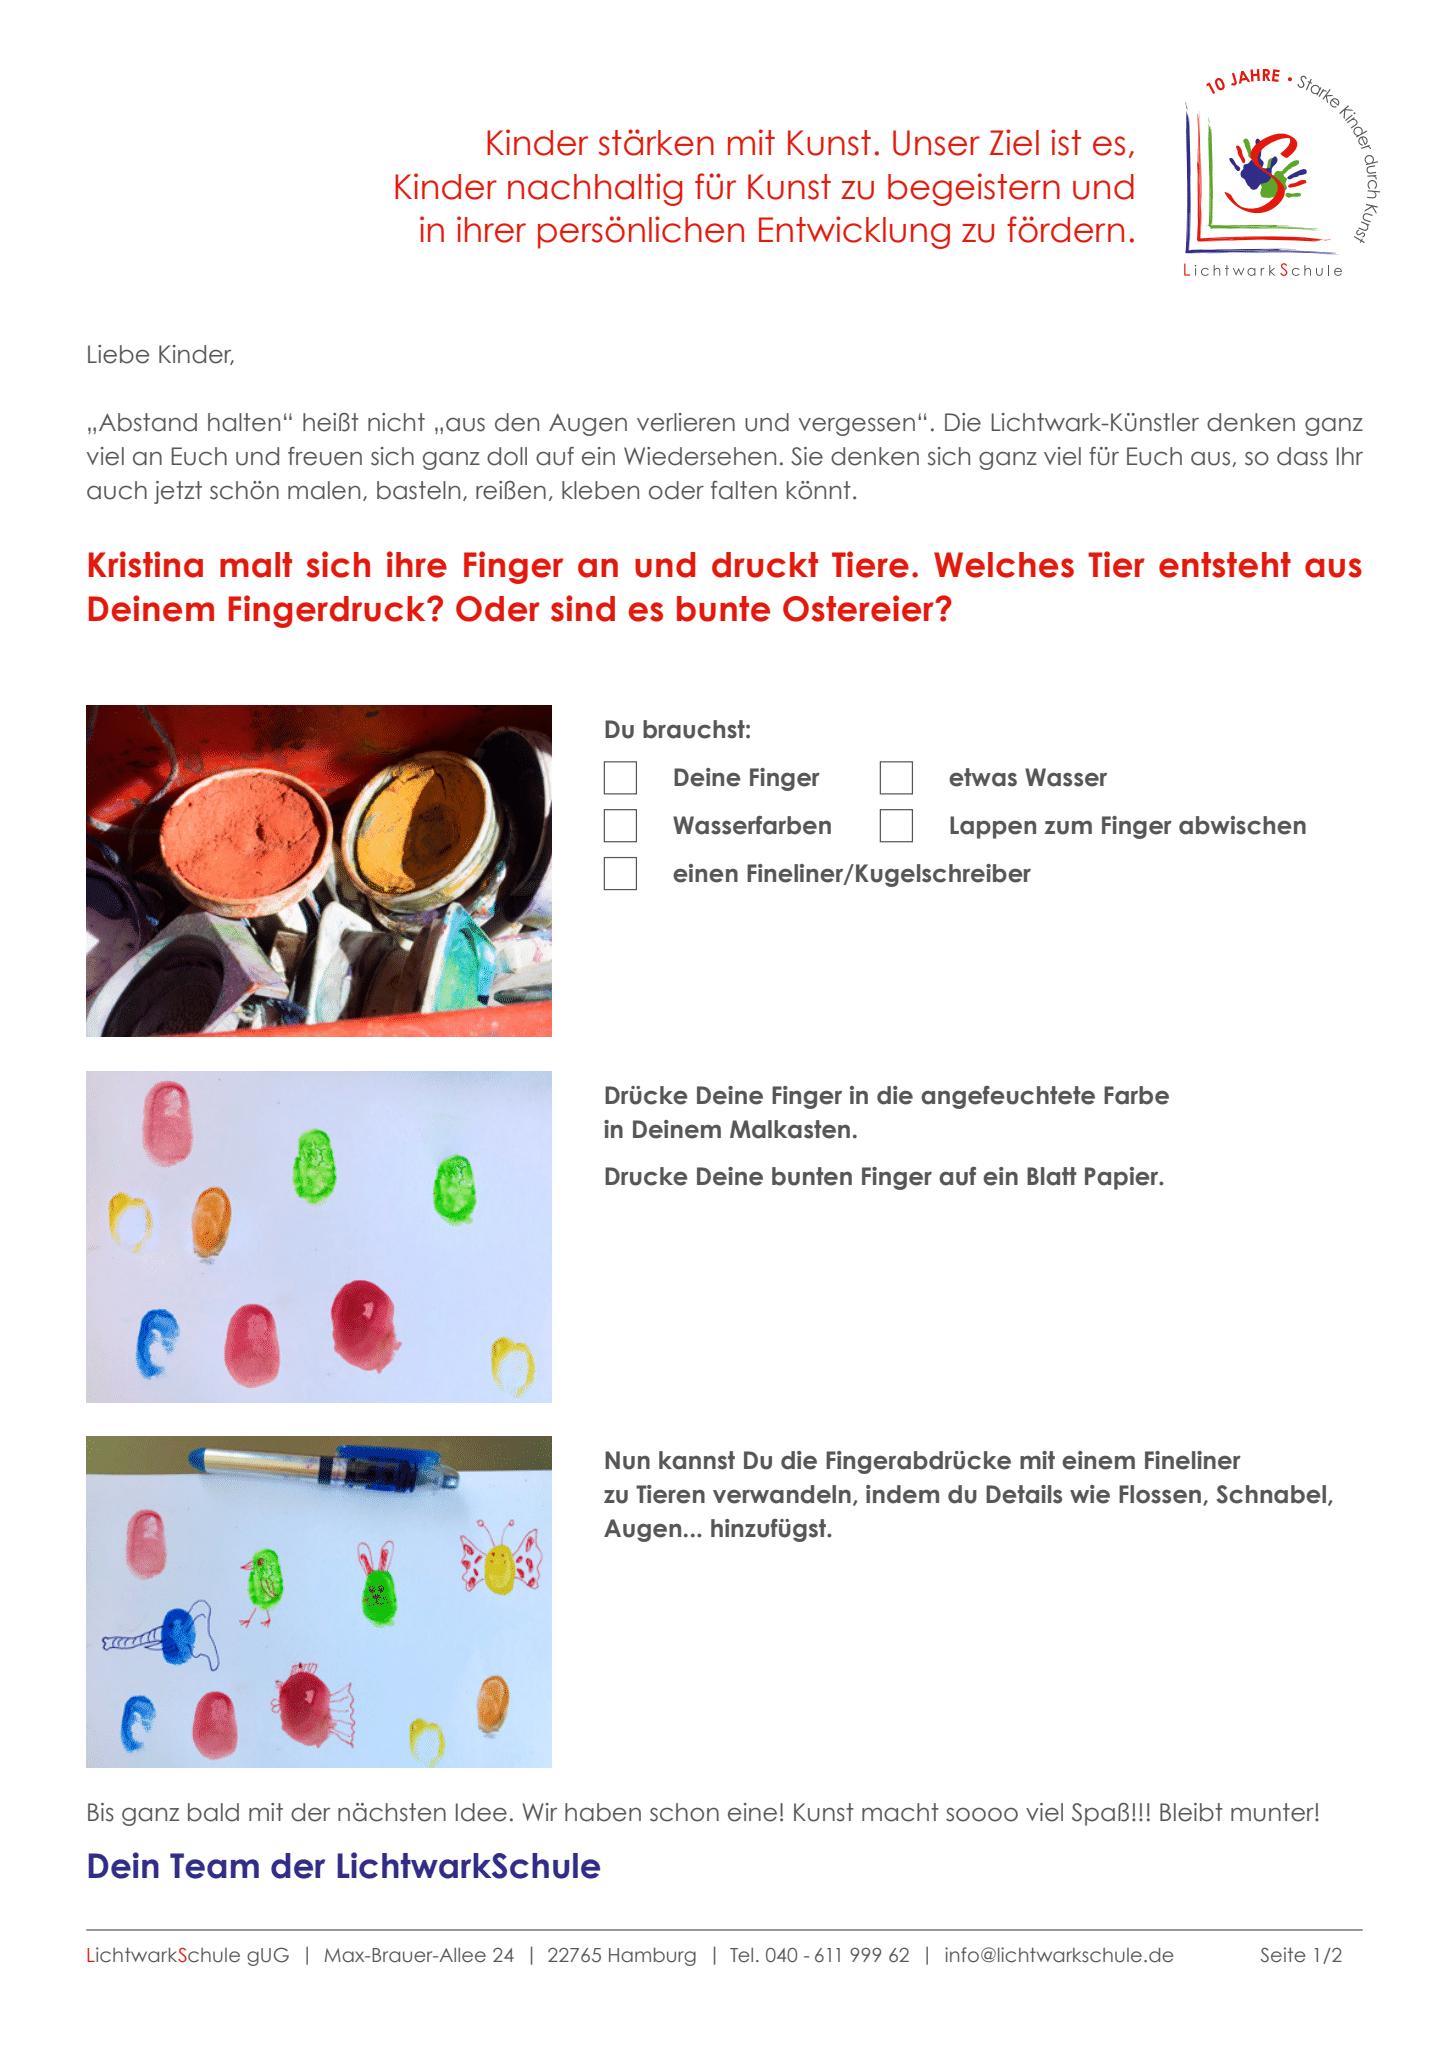 Grundschule Kroonhorst Ganztagsschule An Der Osdorfer Feldmark 5 Fingerabdrucke